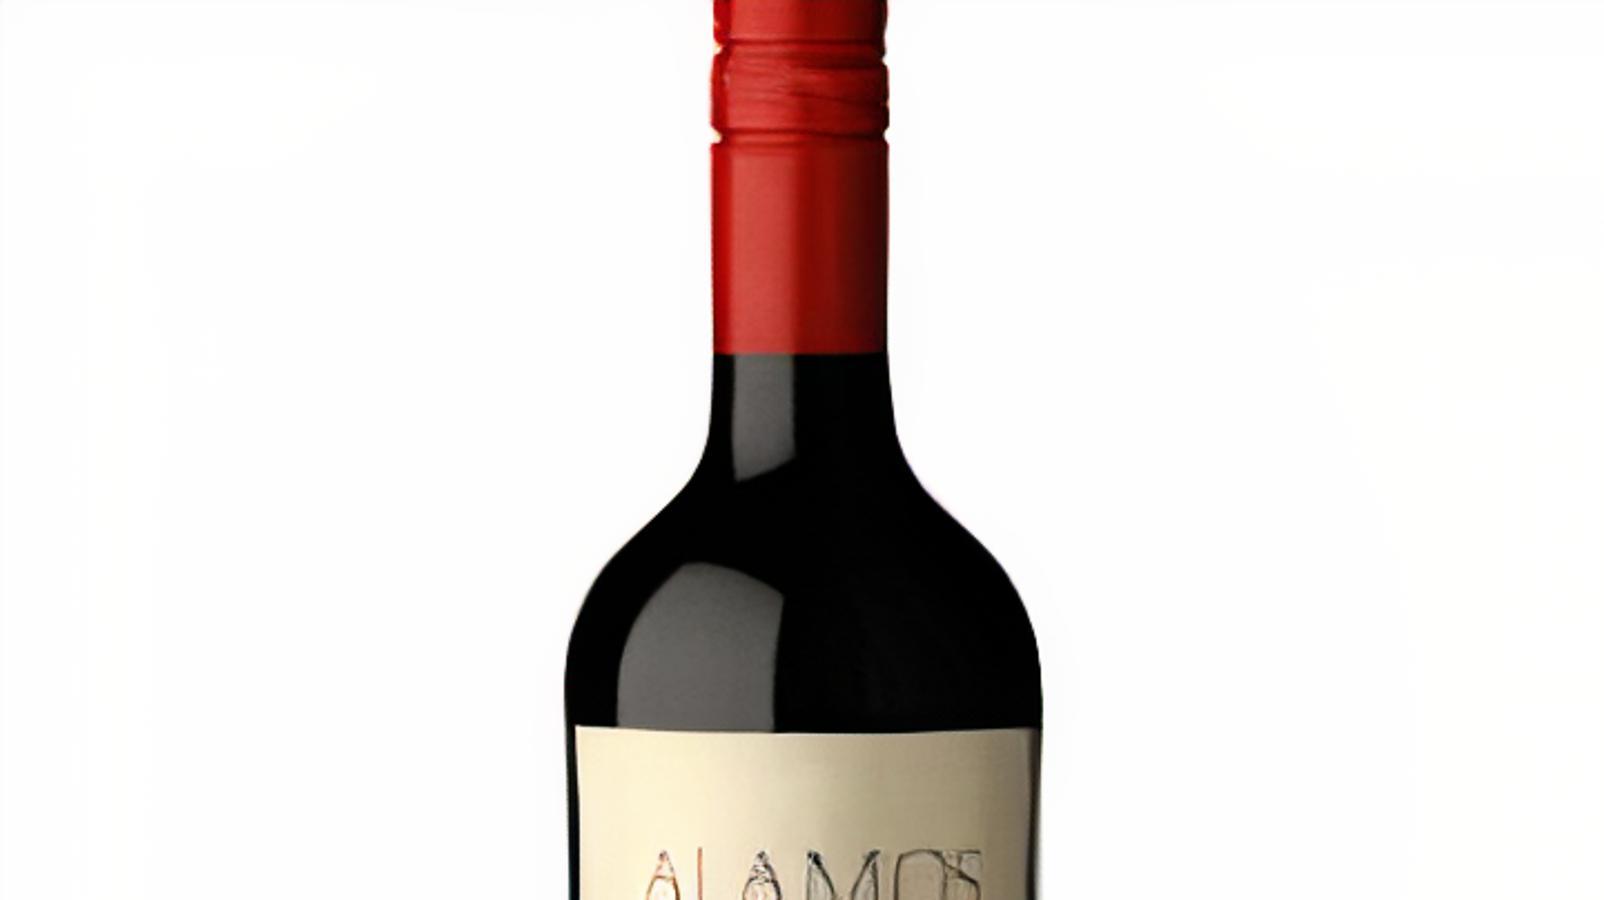 Alamos Malbec, 750mL red wine (13.5% ABV)